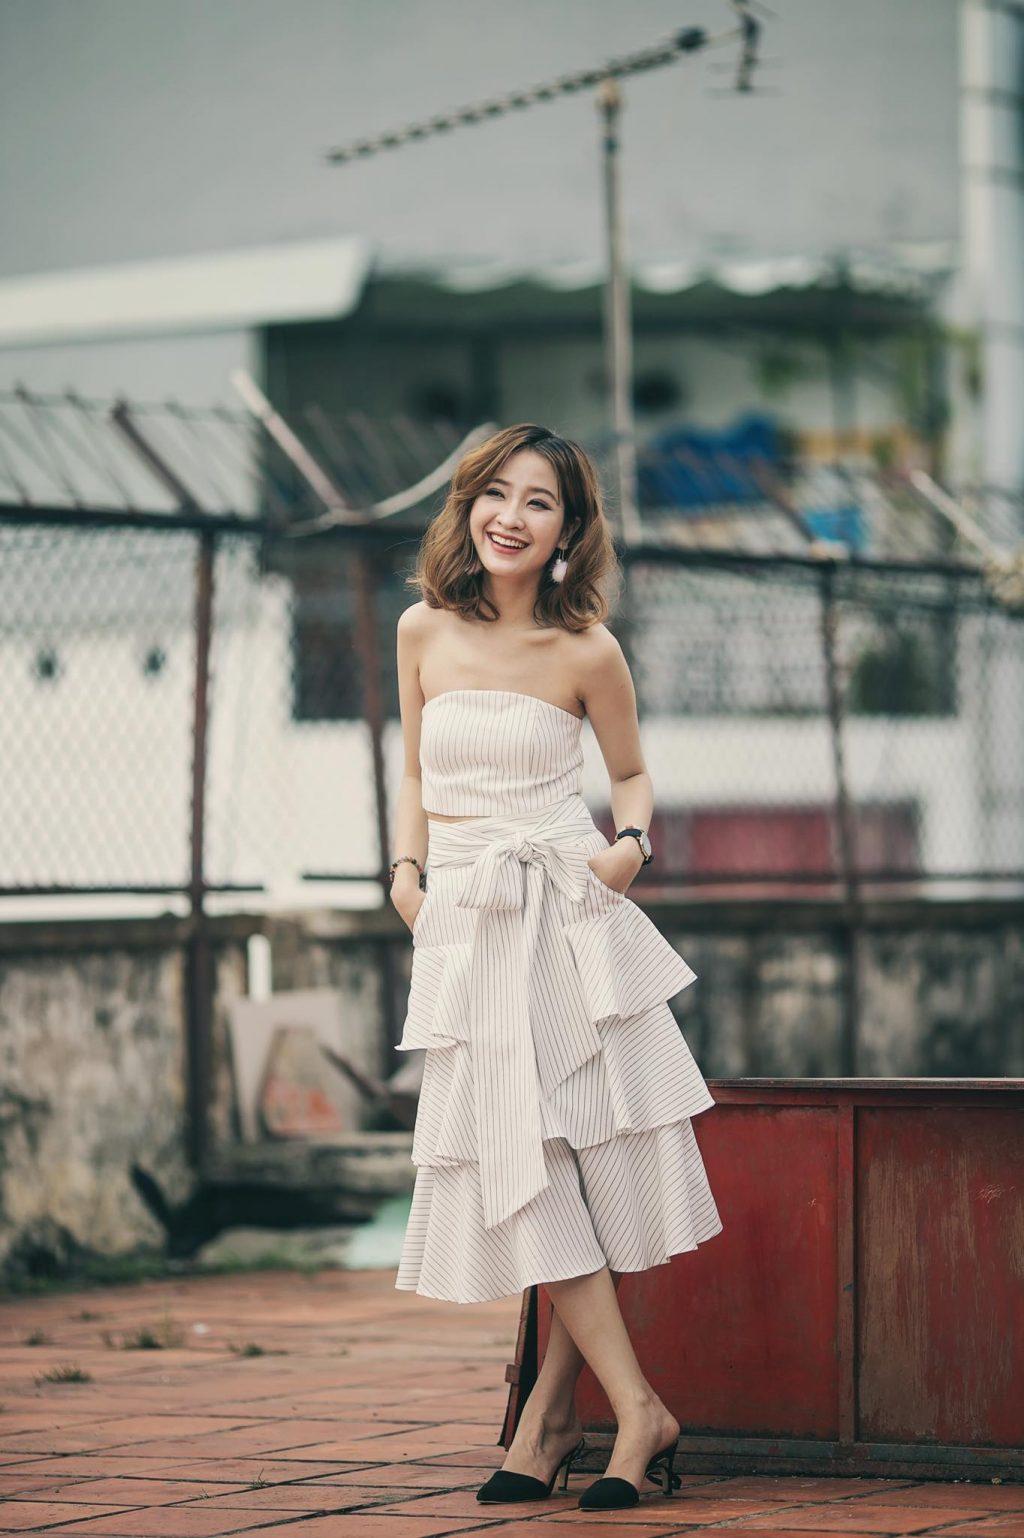 VJ Kim Nha tuy khong giau co nhung toi co 1 cuoc song thanh cong 2